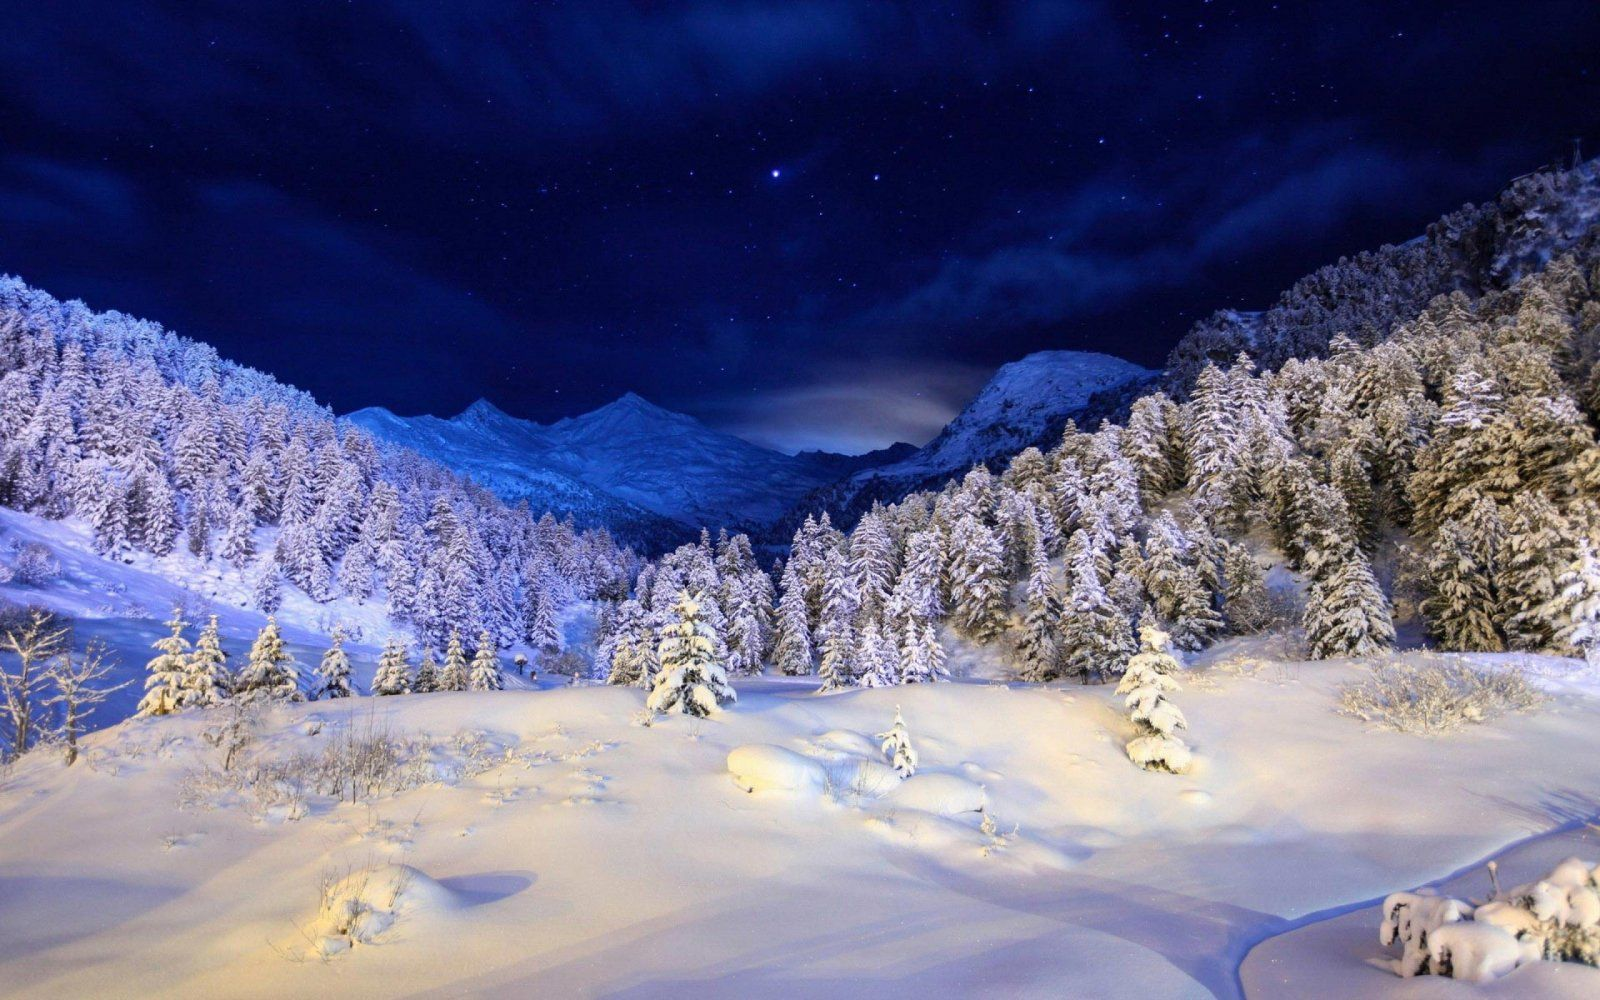 Resultado de imagen para paisajes nieve